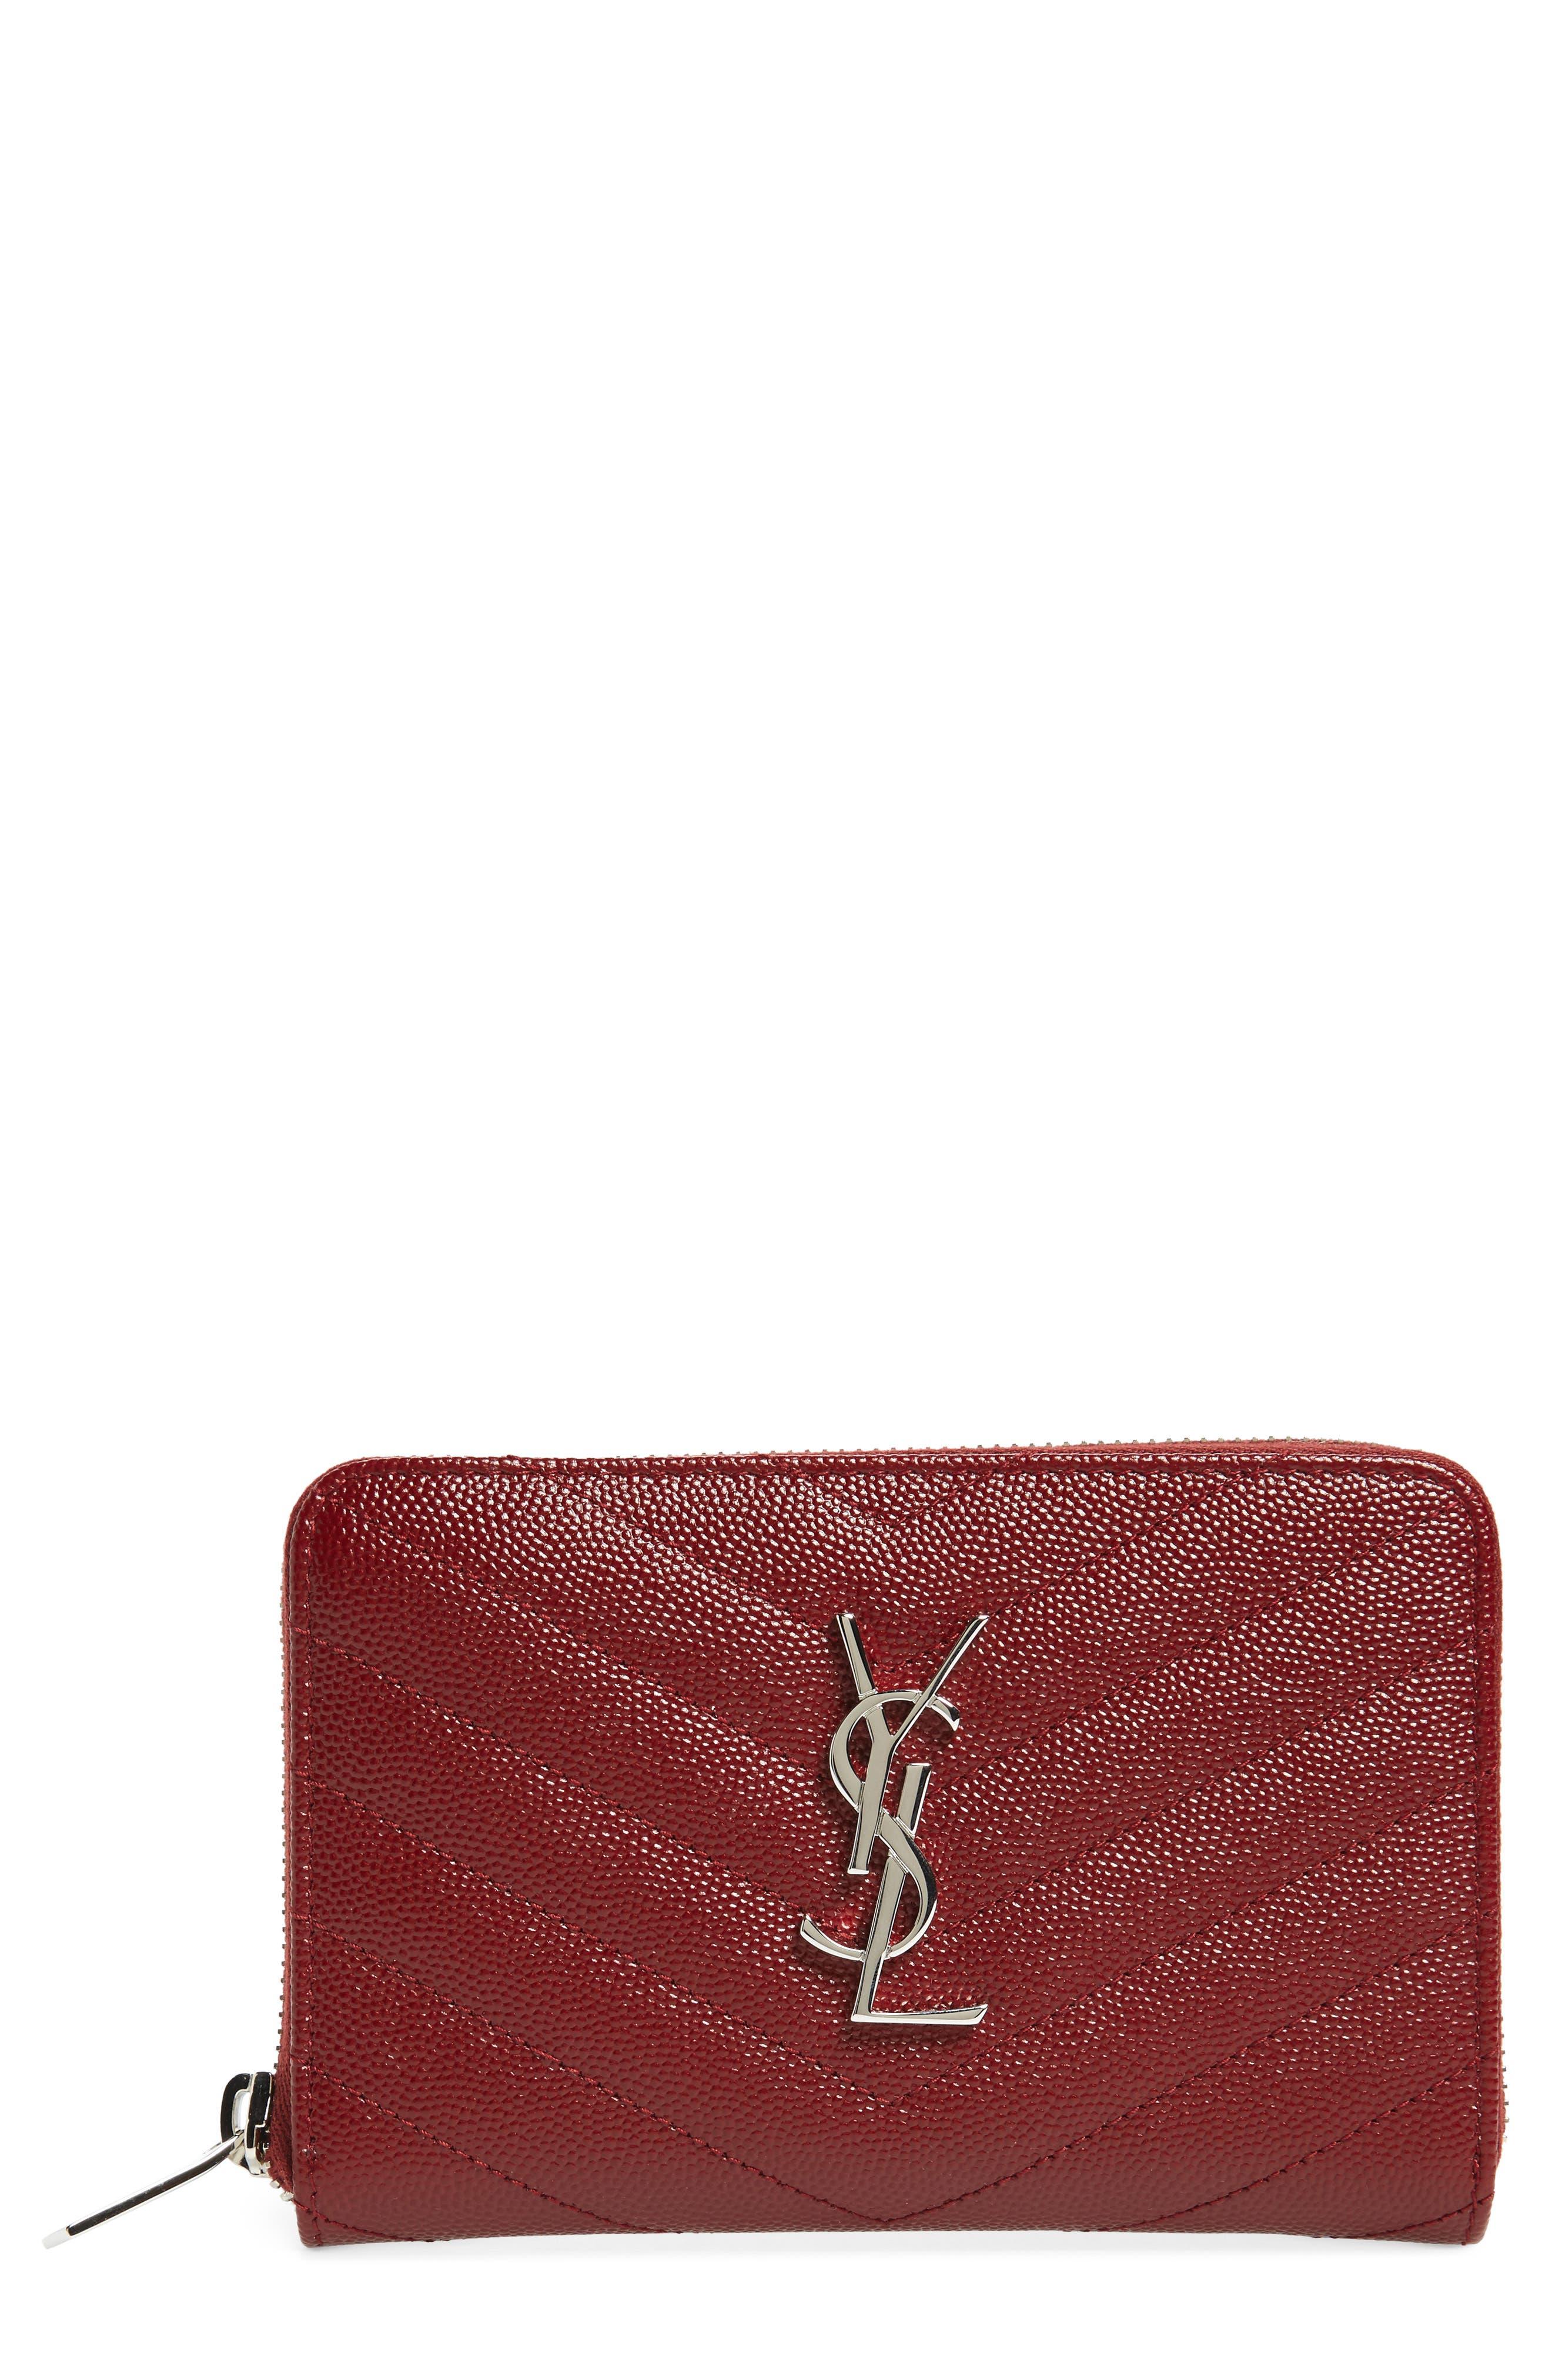 Saint Laurent Small Grained Leather Zip Around Wallet